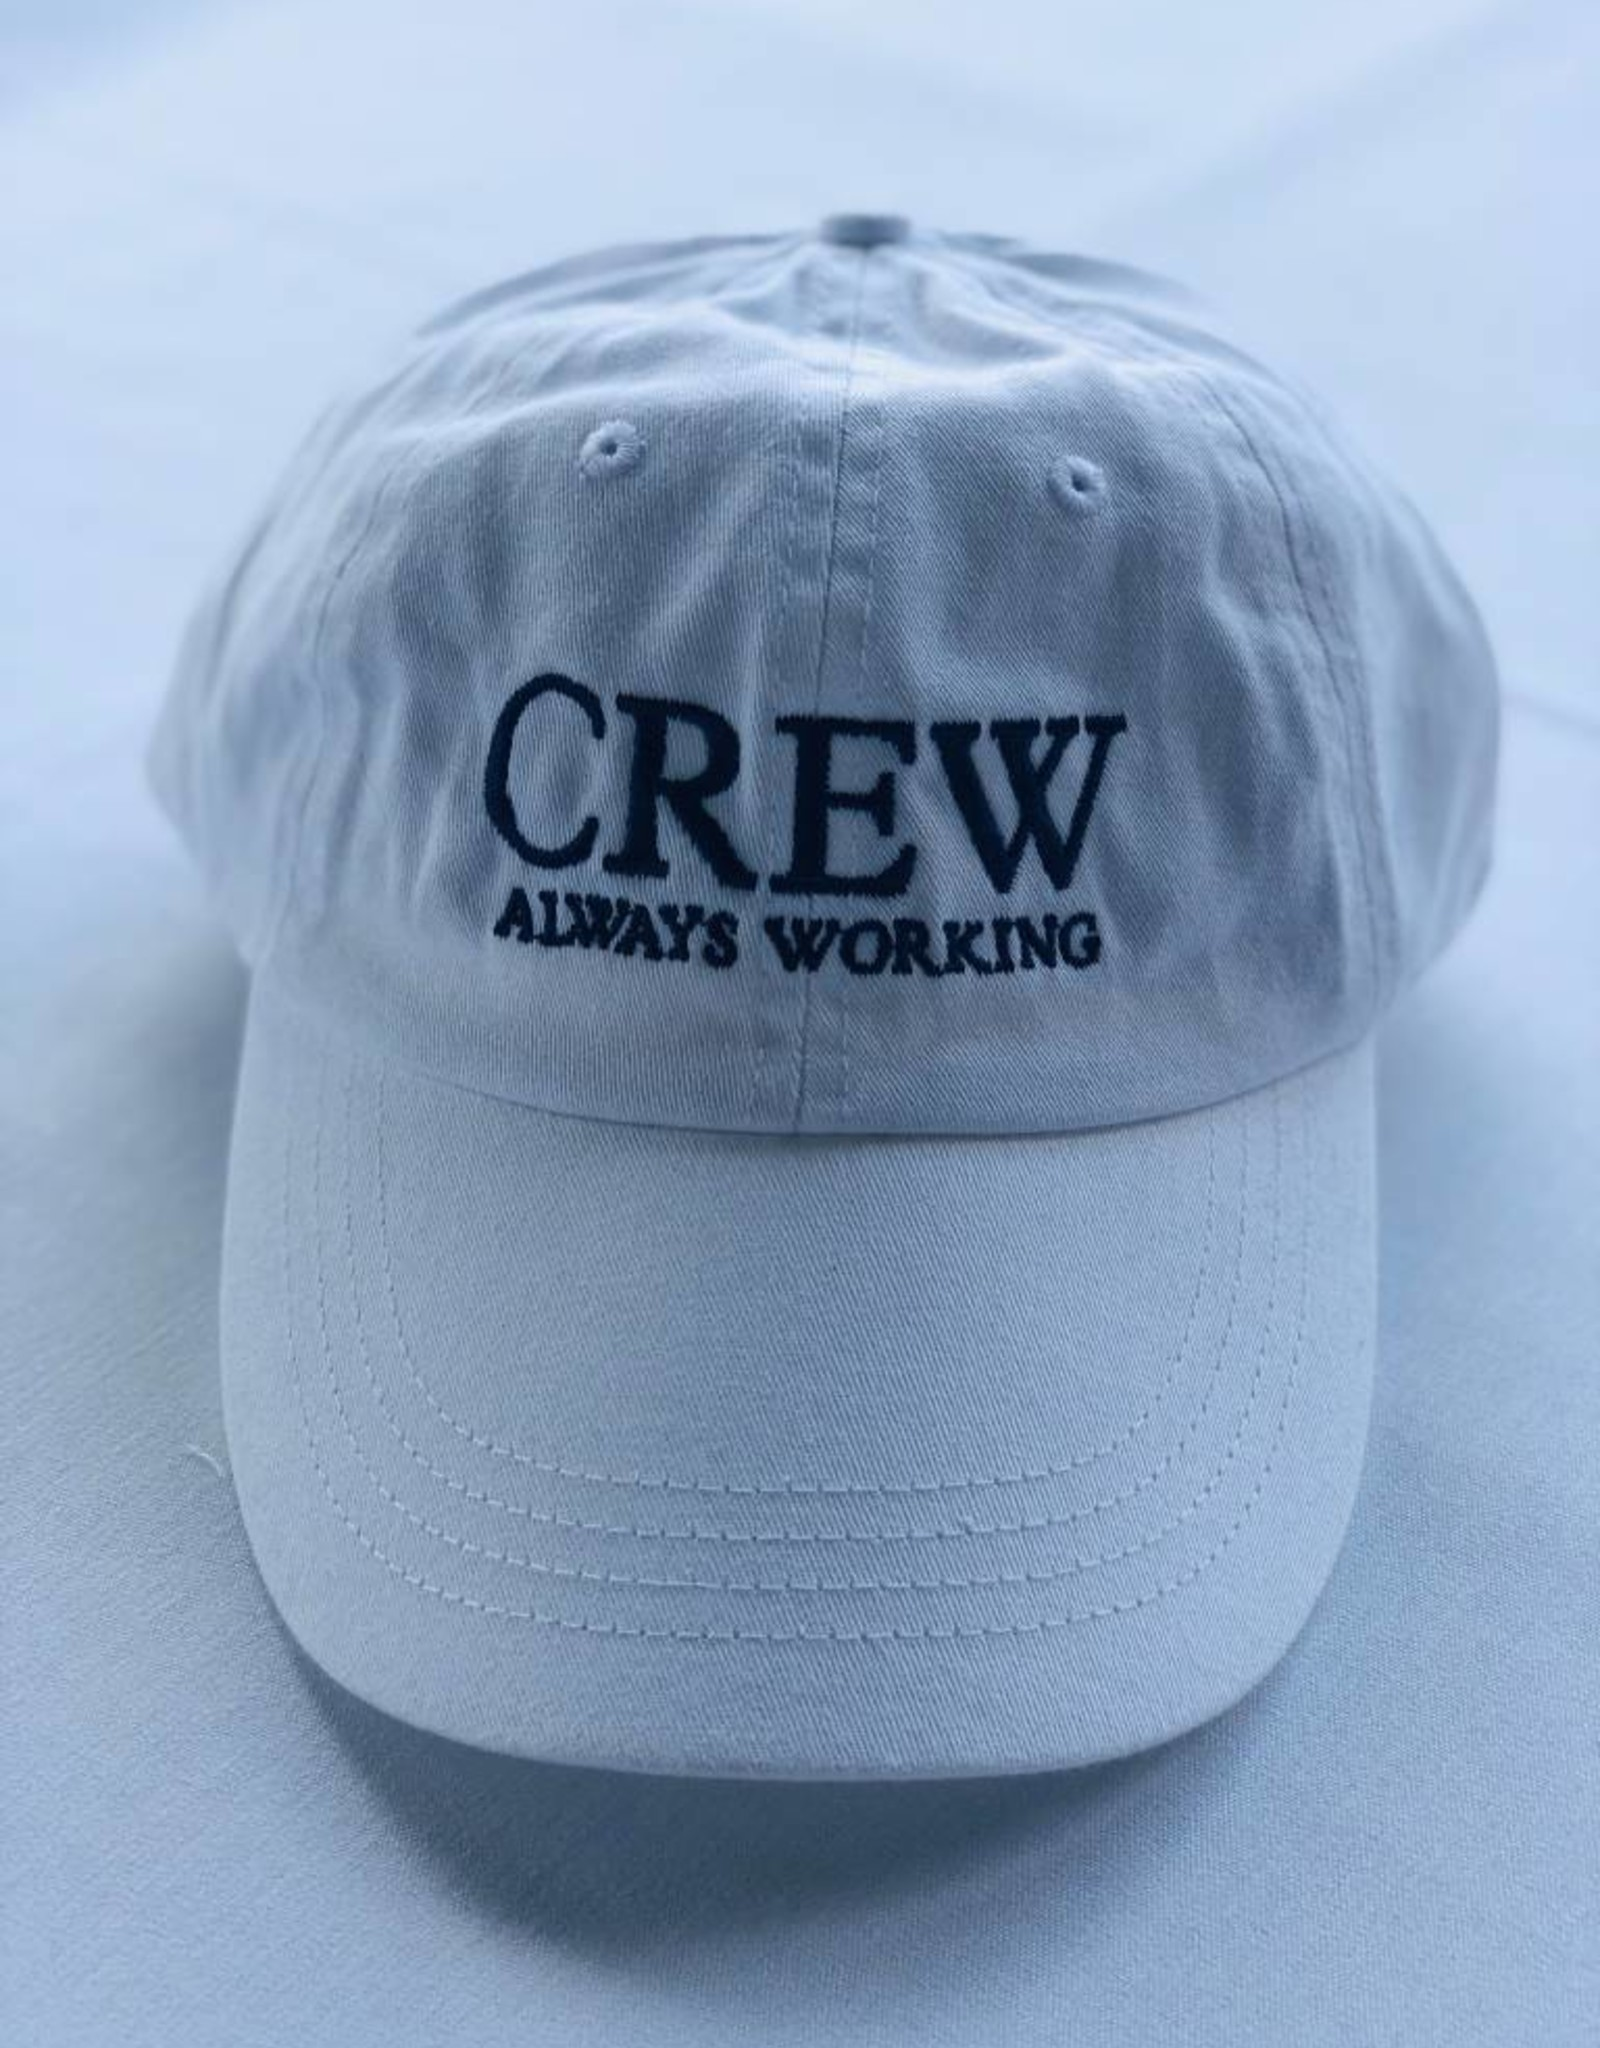 BOATHOUSE CREW ALWAYS WORKING AQUA HAT